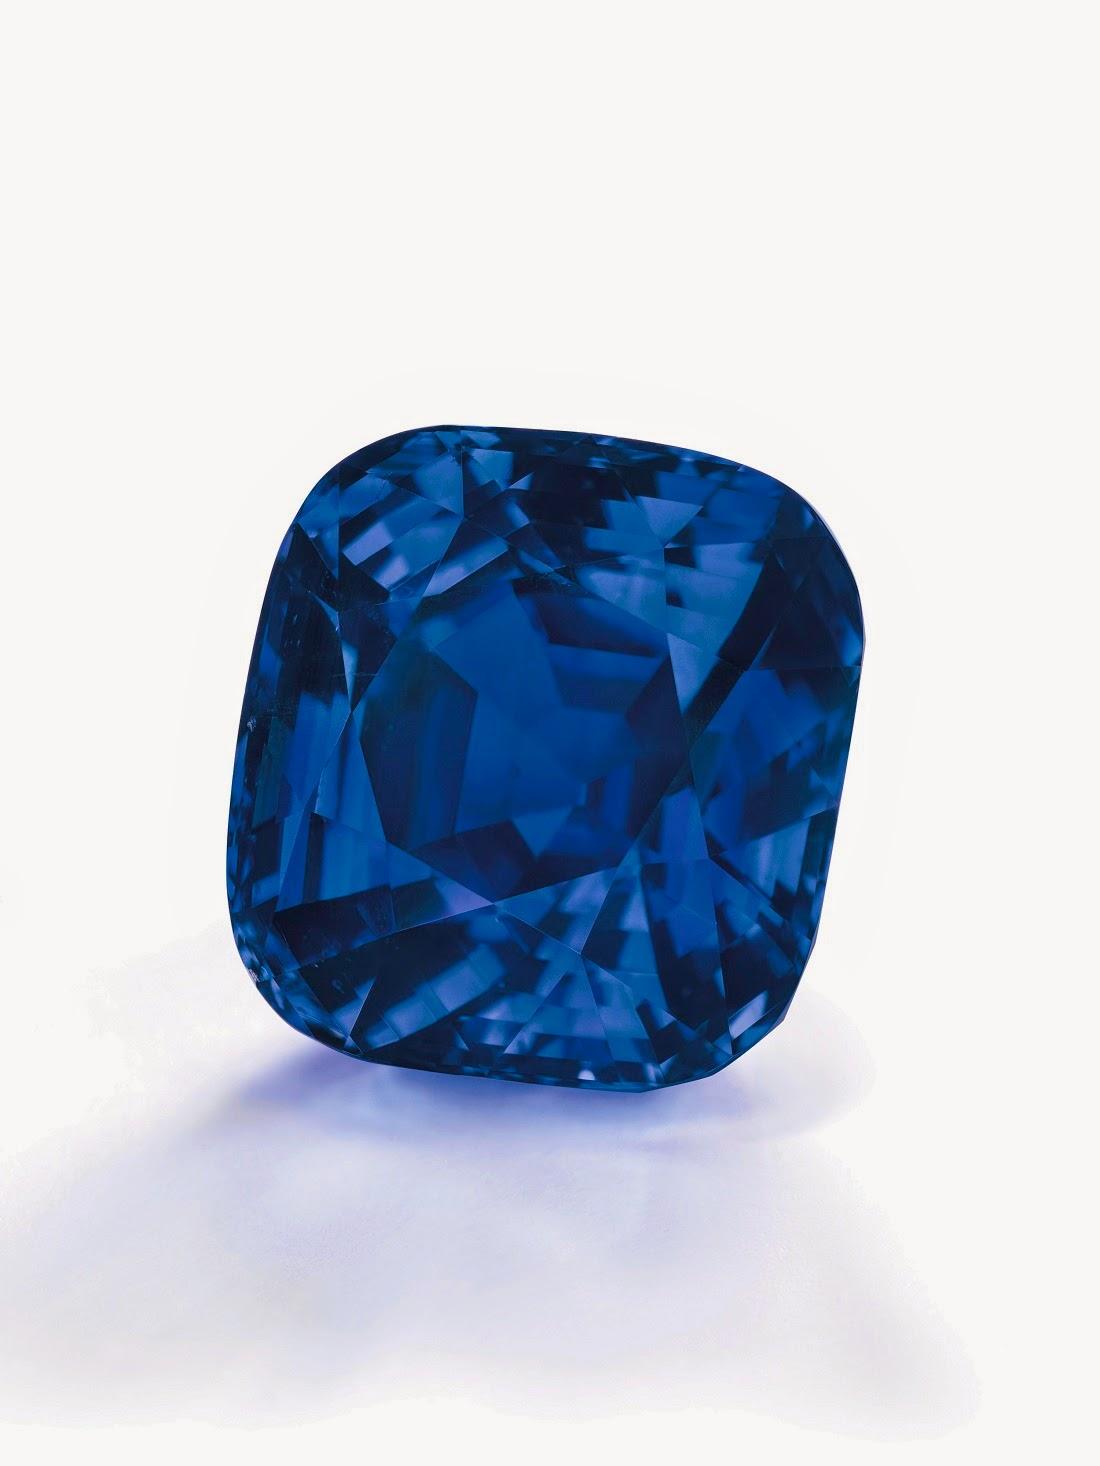 Jewelry News Network Kashmir Sapphire Sets Record Jackie